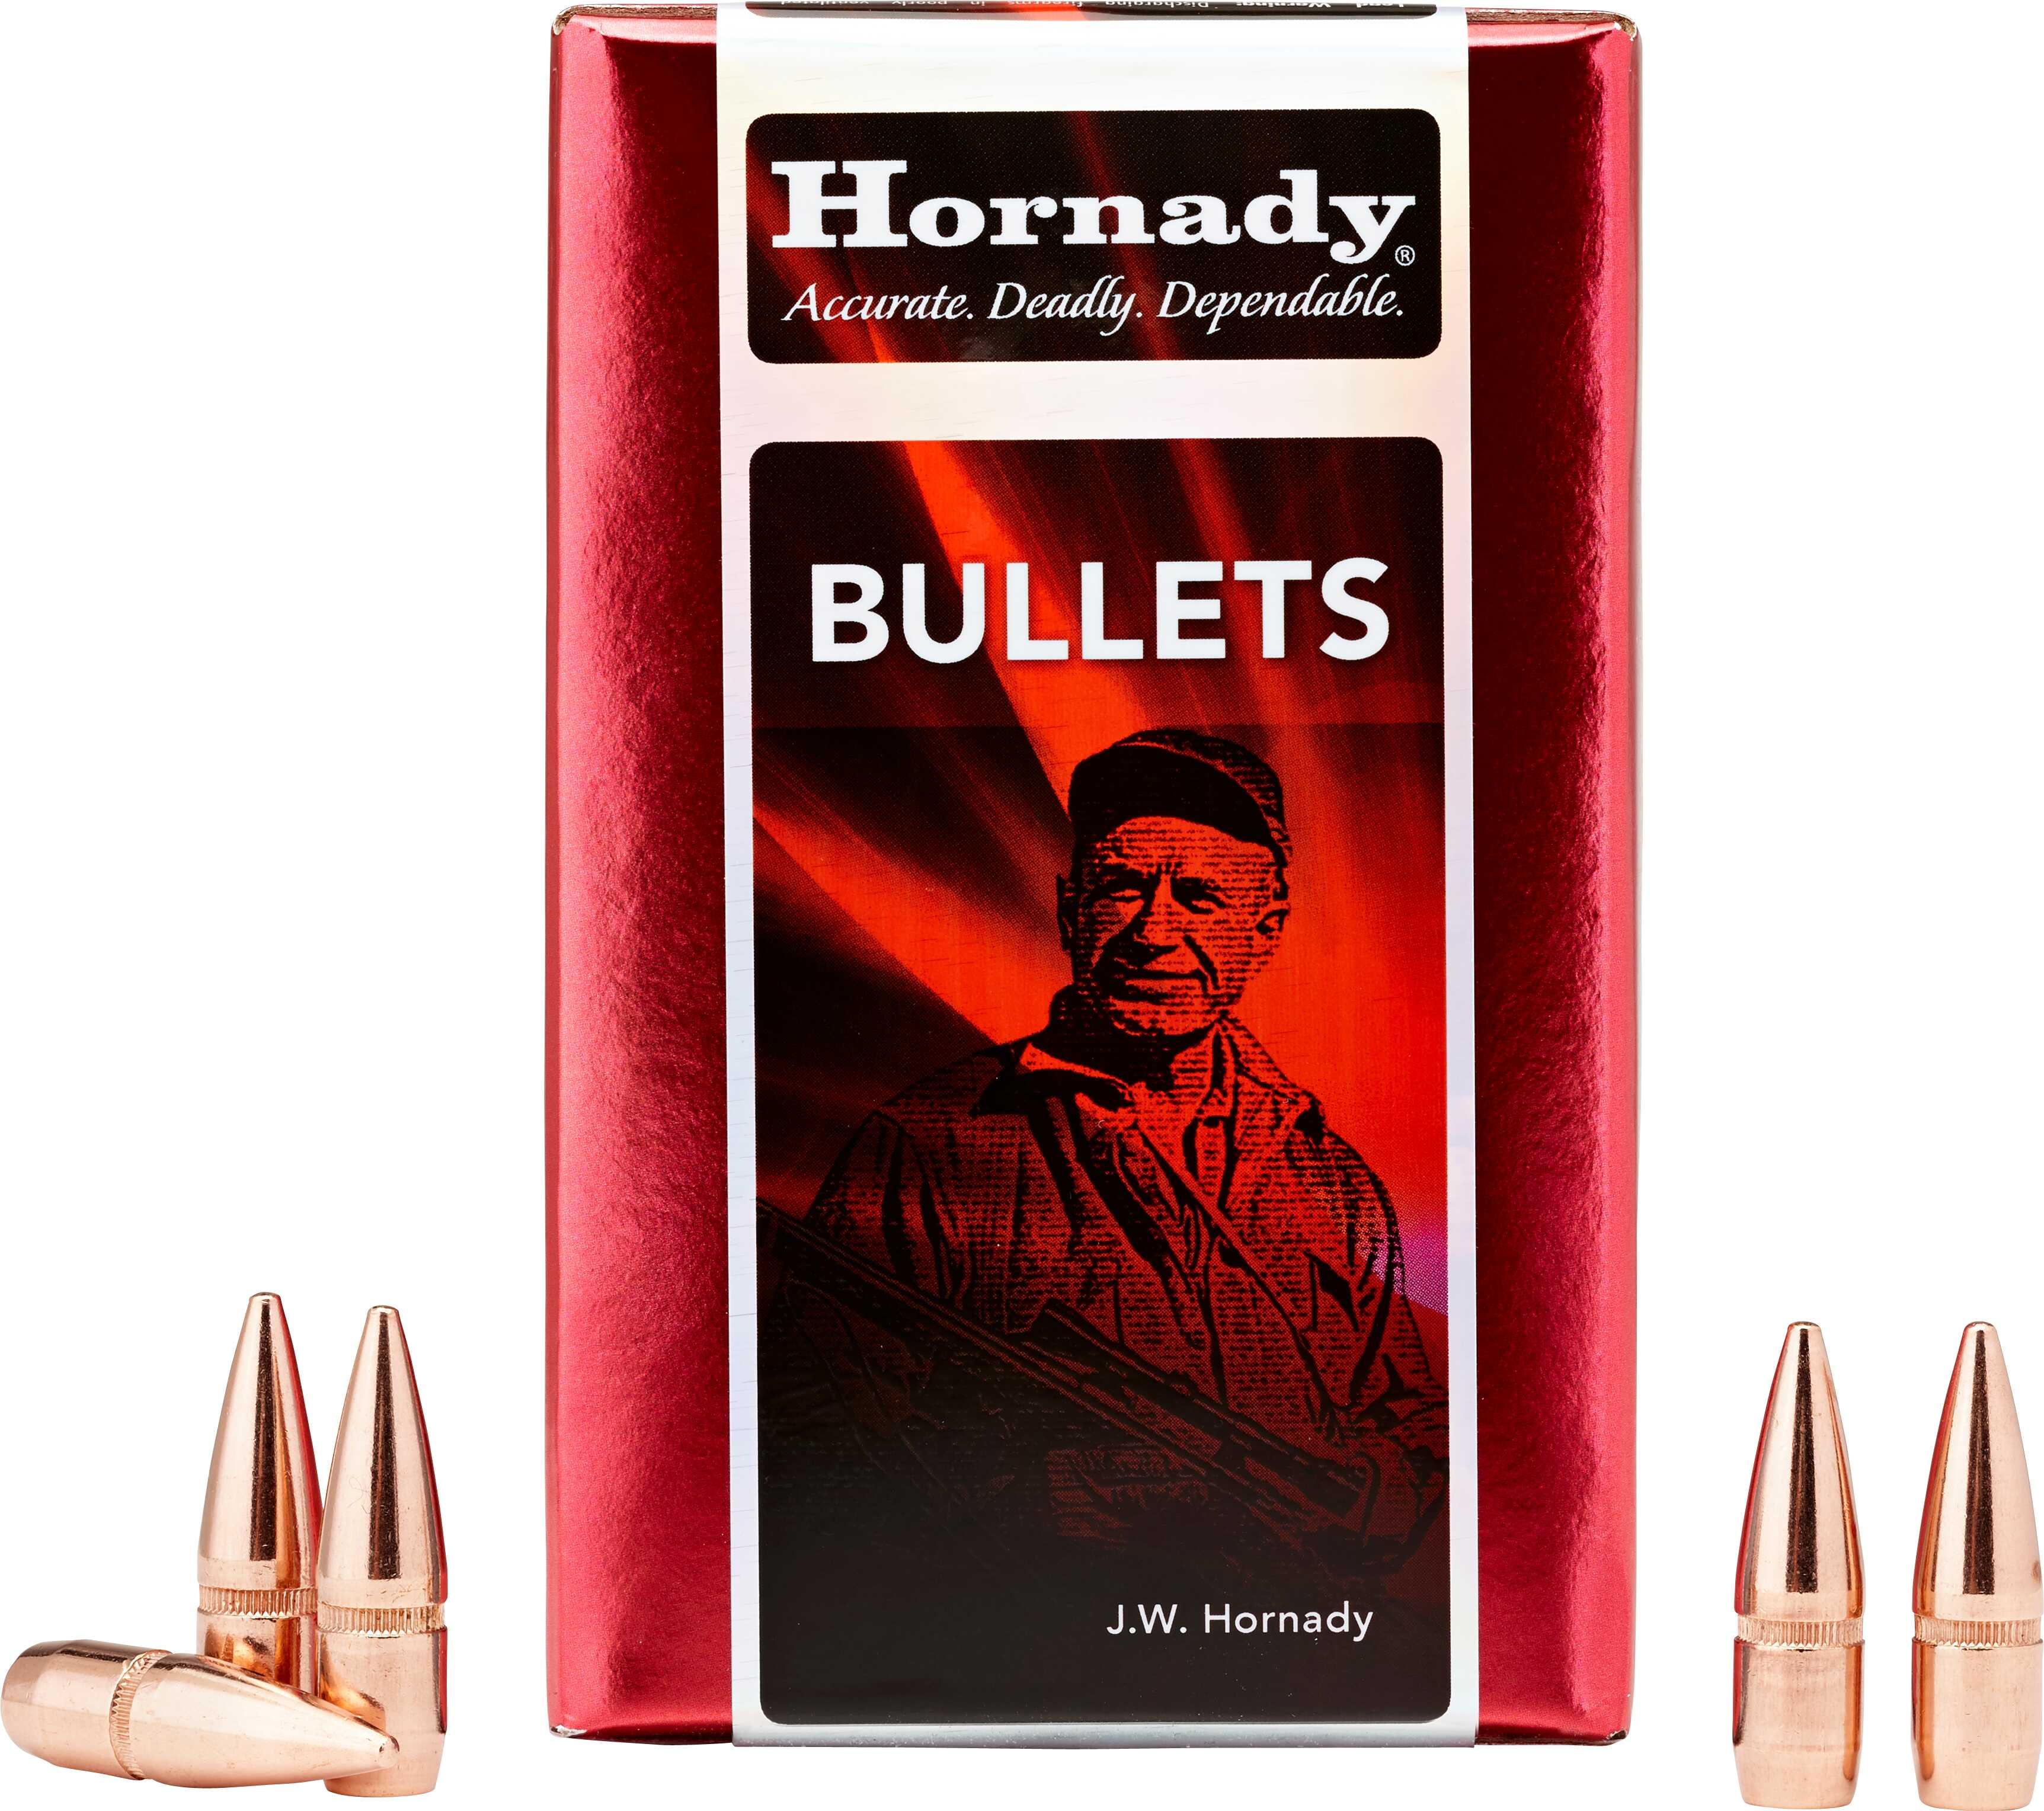 Hornady 9.3 Caliber / .366 286 Grain SP/Rp/50 Md: 3560 Bullets